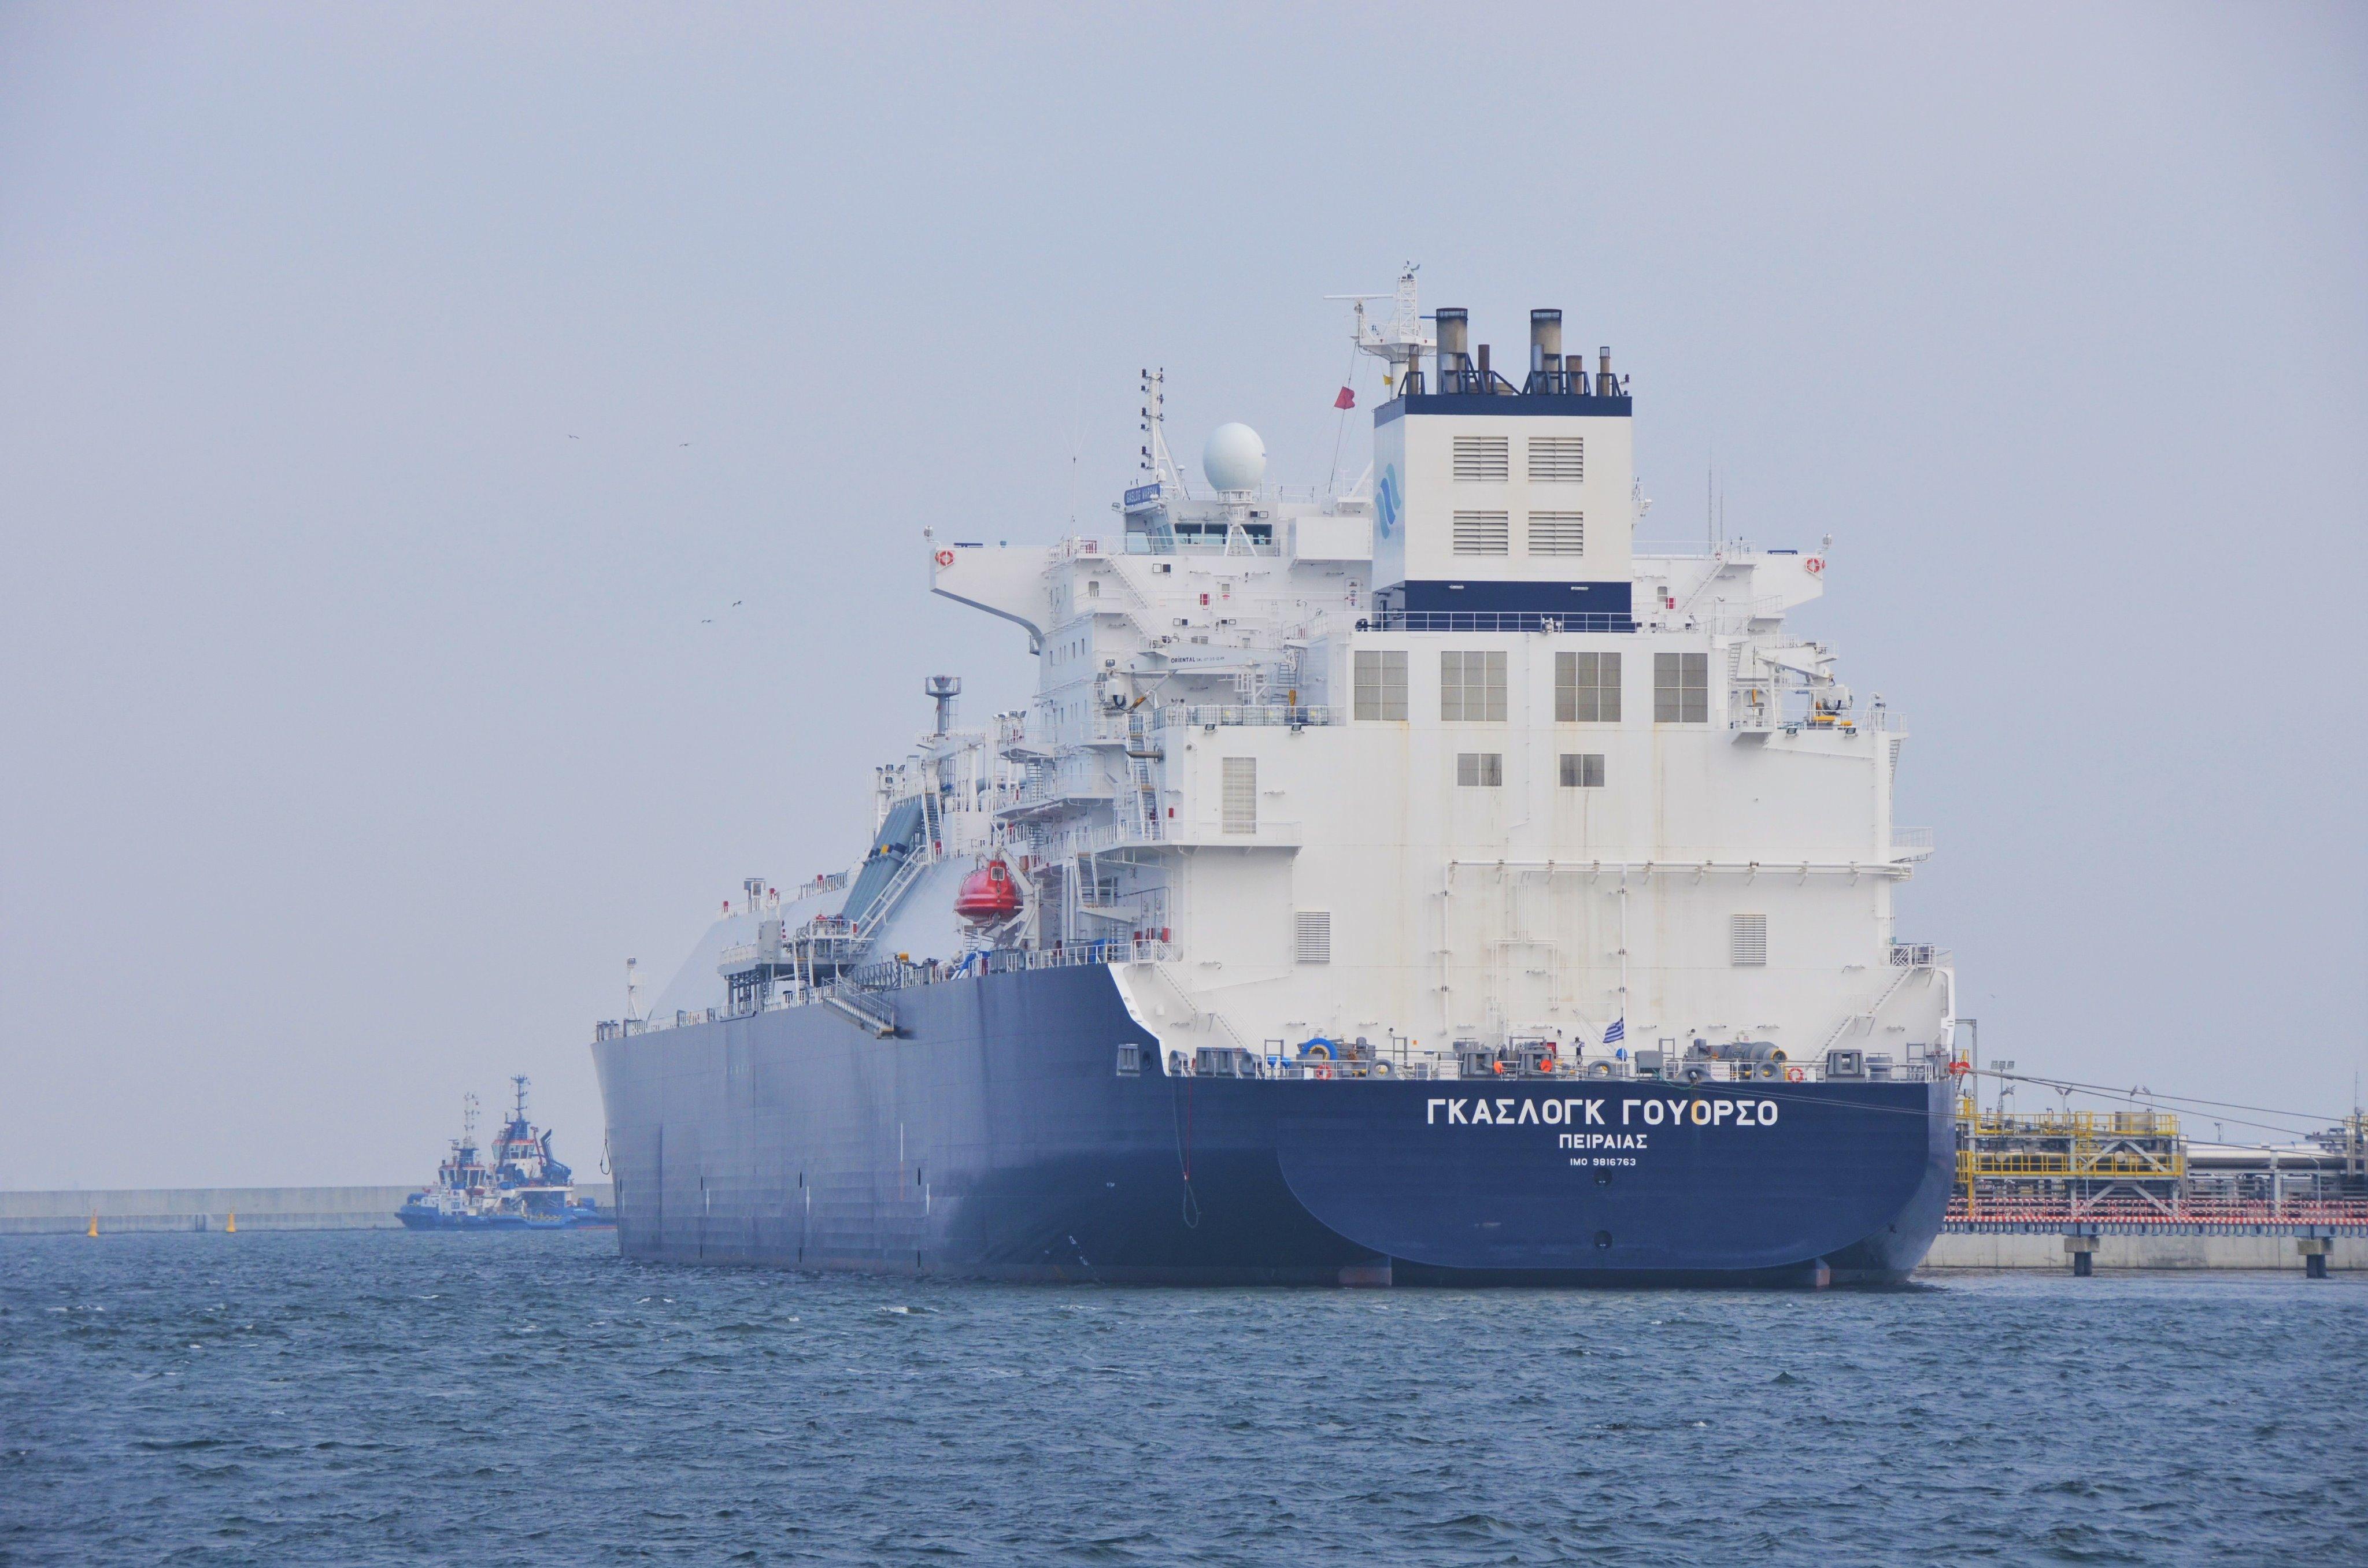 Polish LNG terminal unloads 92nd cargo